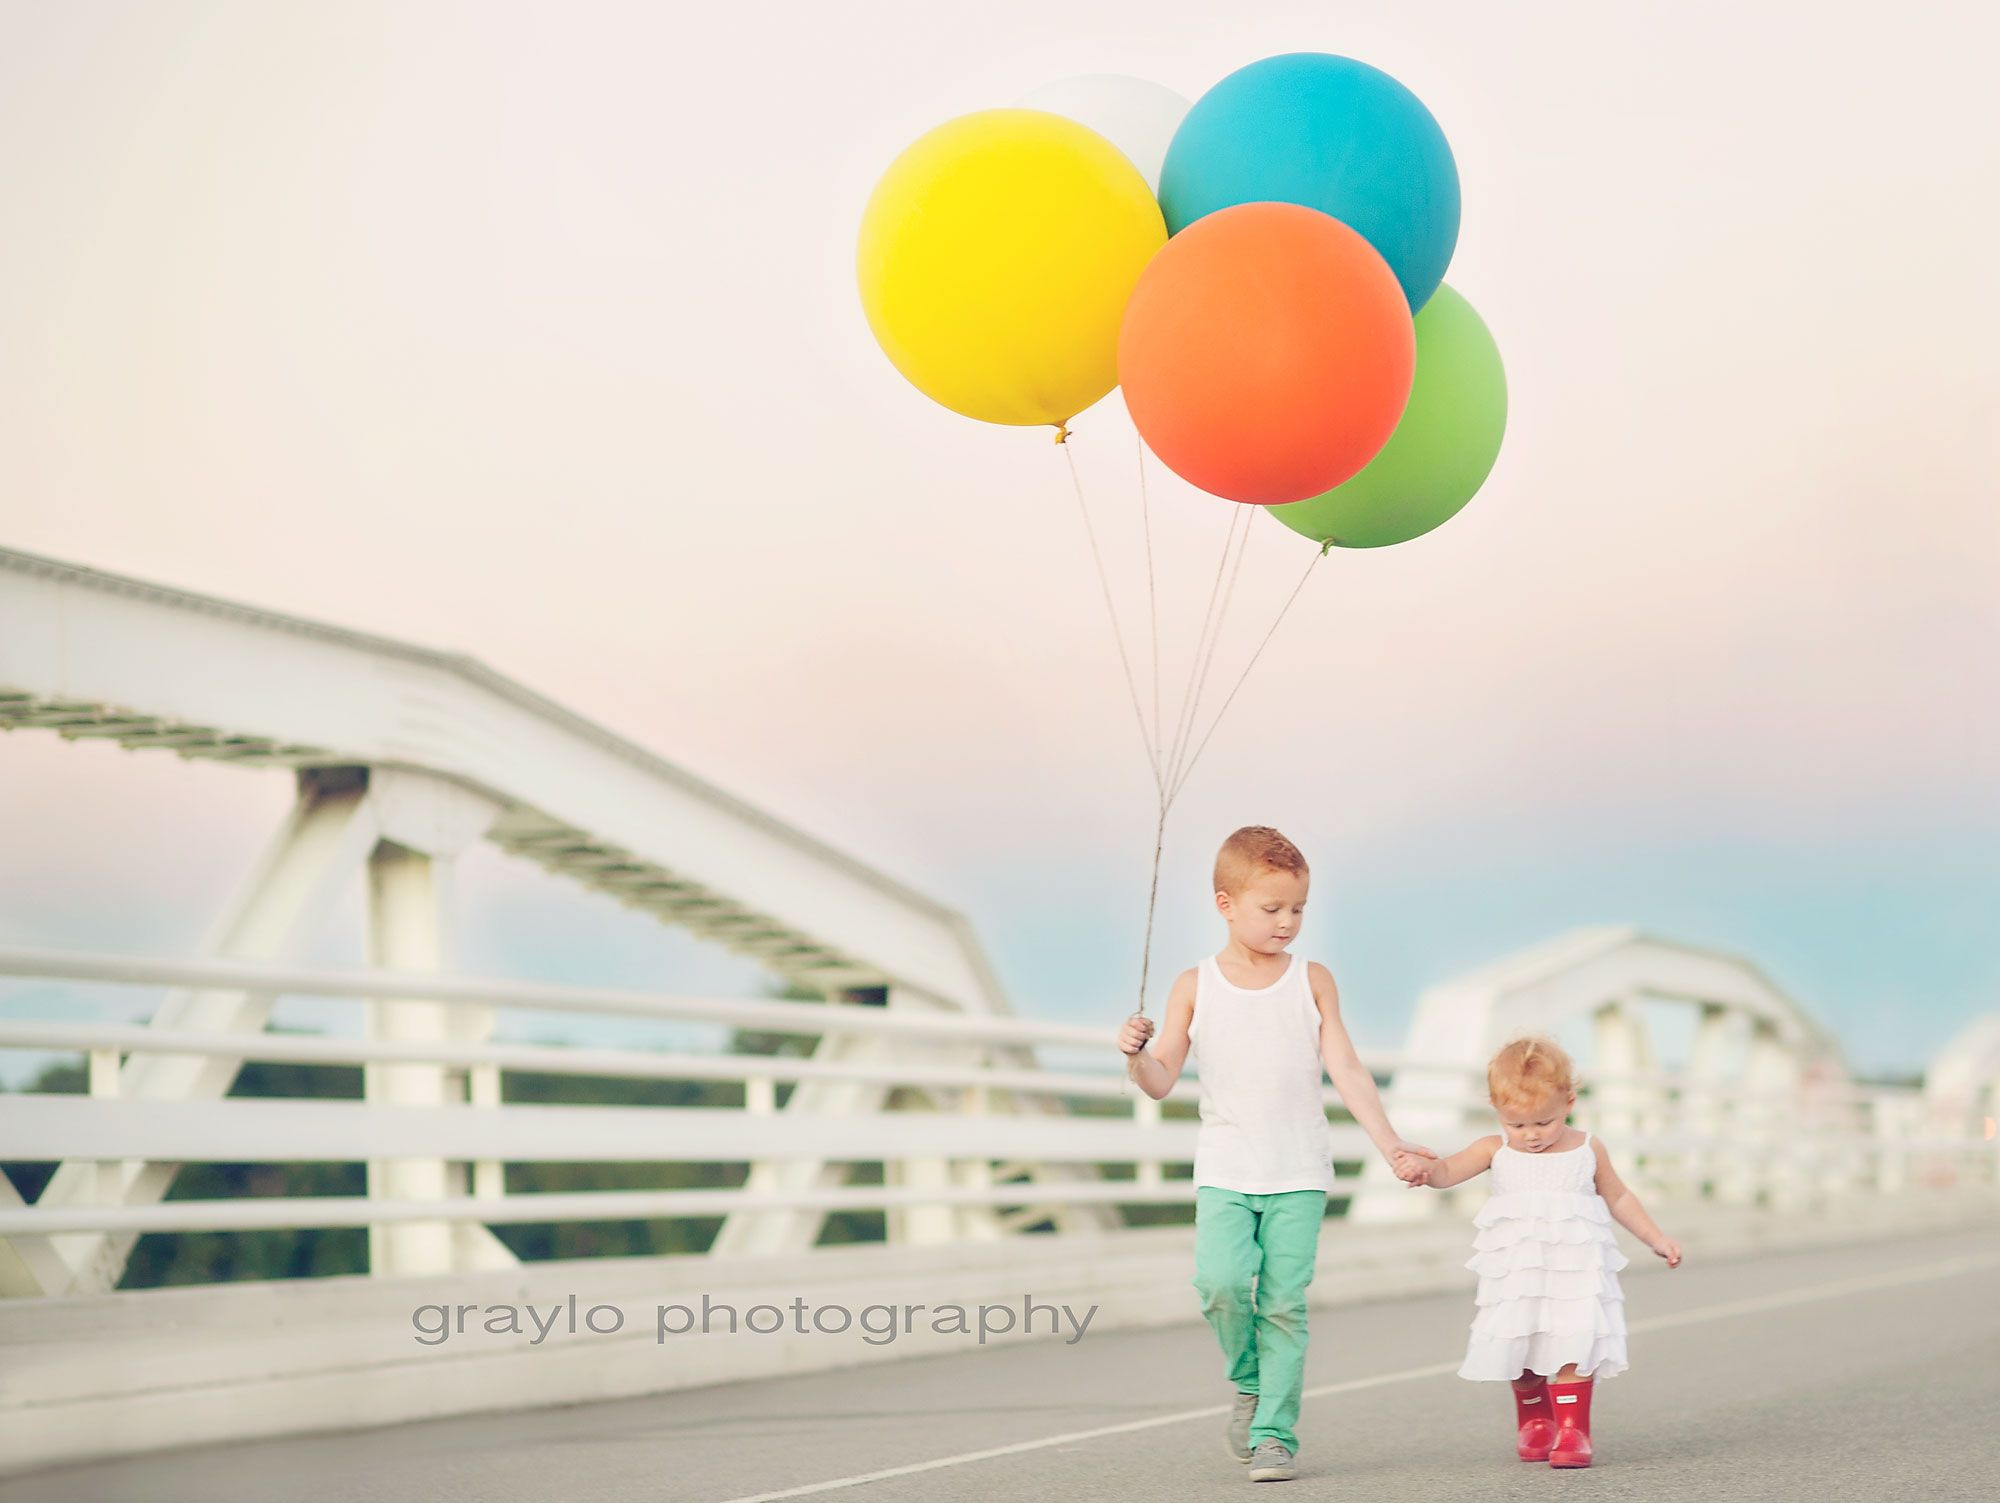 Childrens Photography Ideas Tulsa Photographer Natural Light Fun